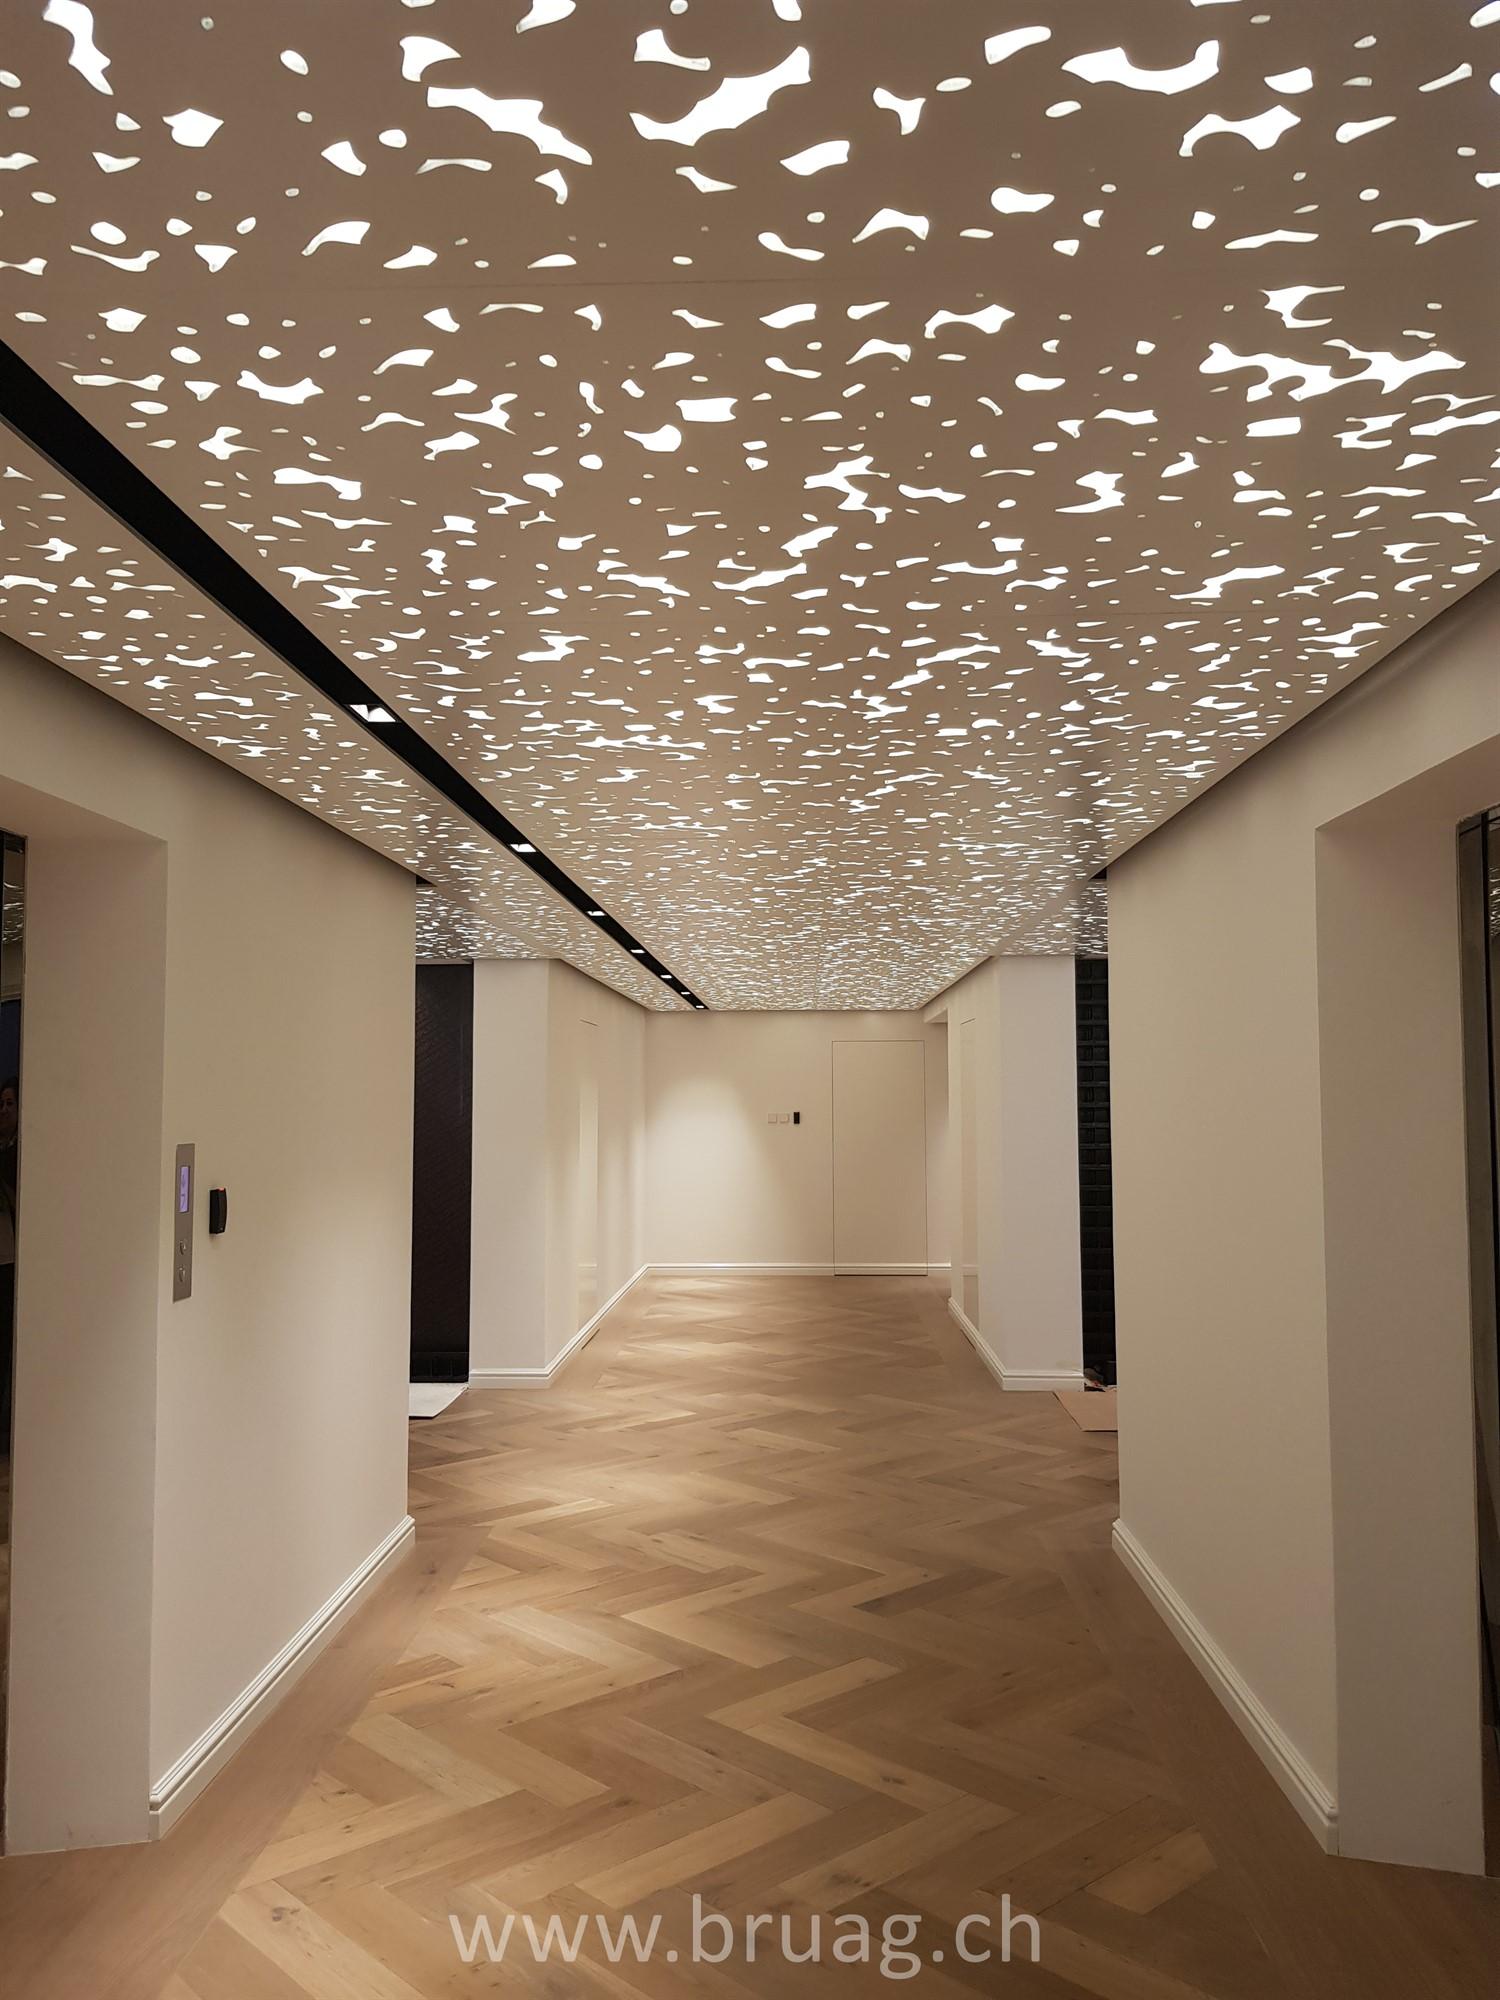 Acoustics Ceiling with Backlight_Bruag_ MDF 10mm_Perforation 10200_Al Masaood CEO Office Abu Dhabi_Avenue Engineering Constultant_2.jpg